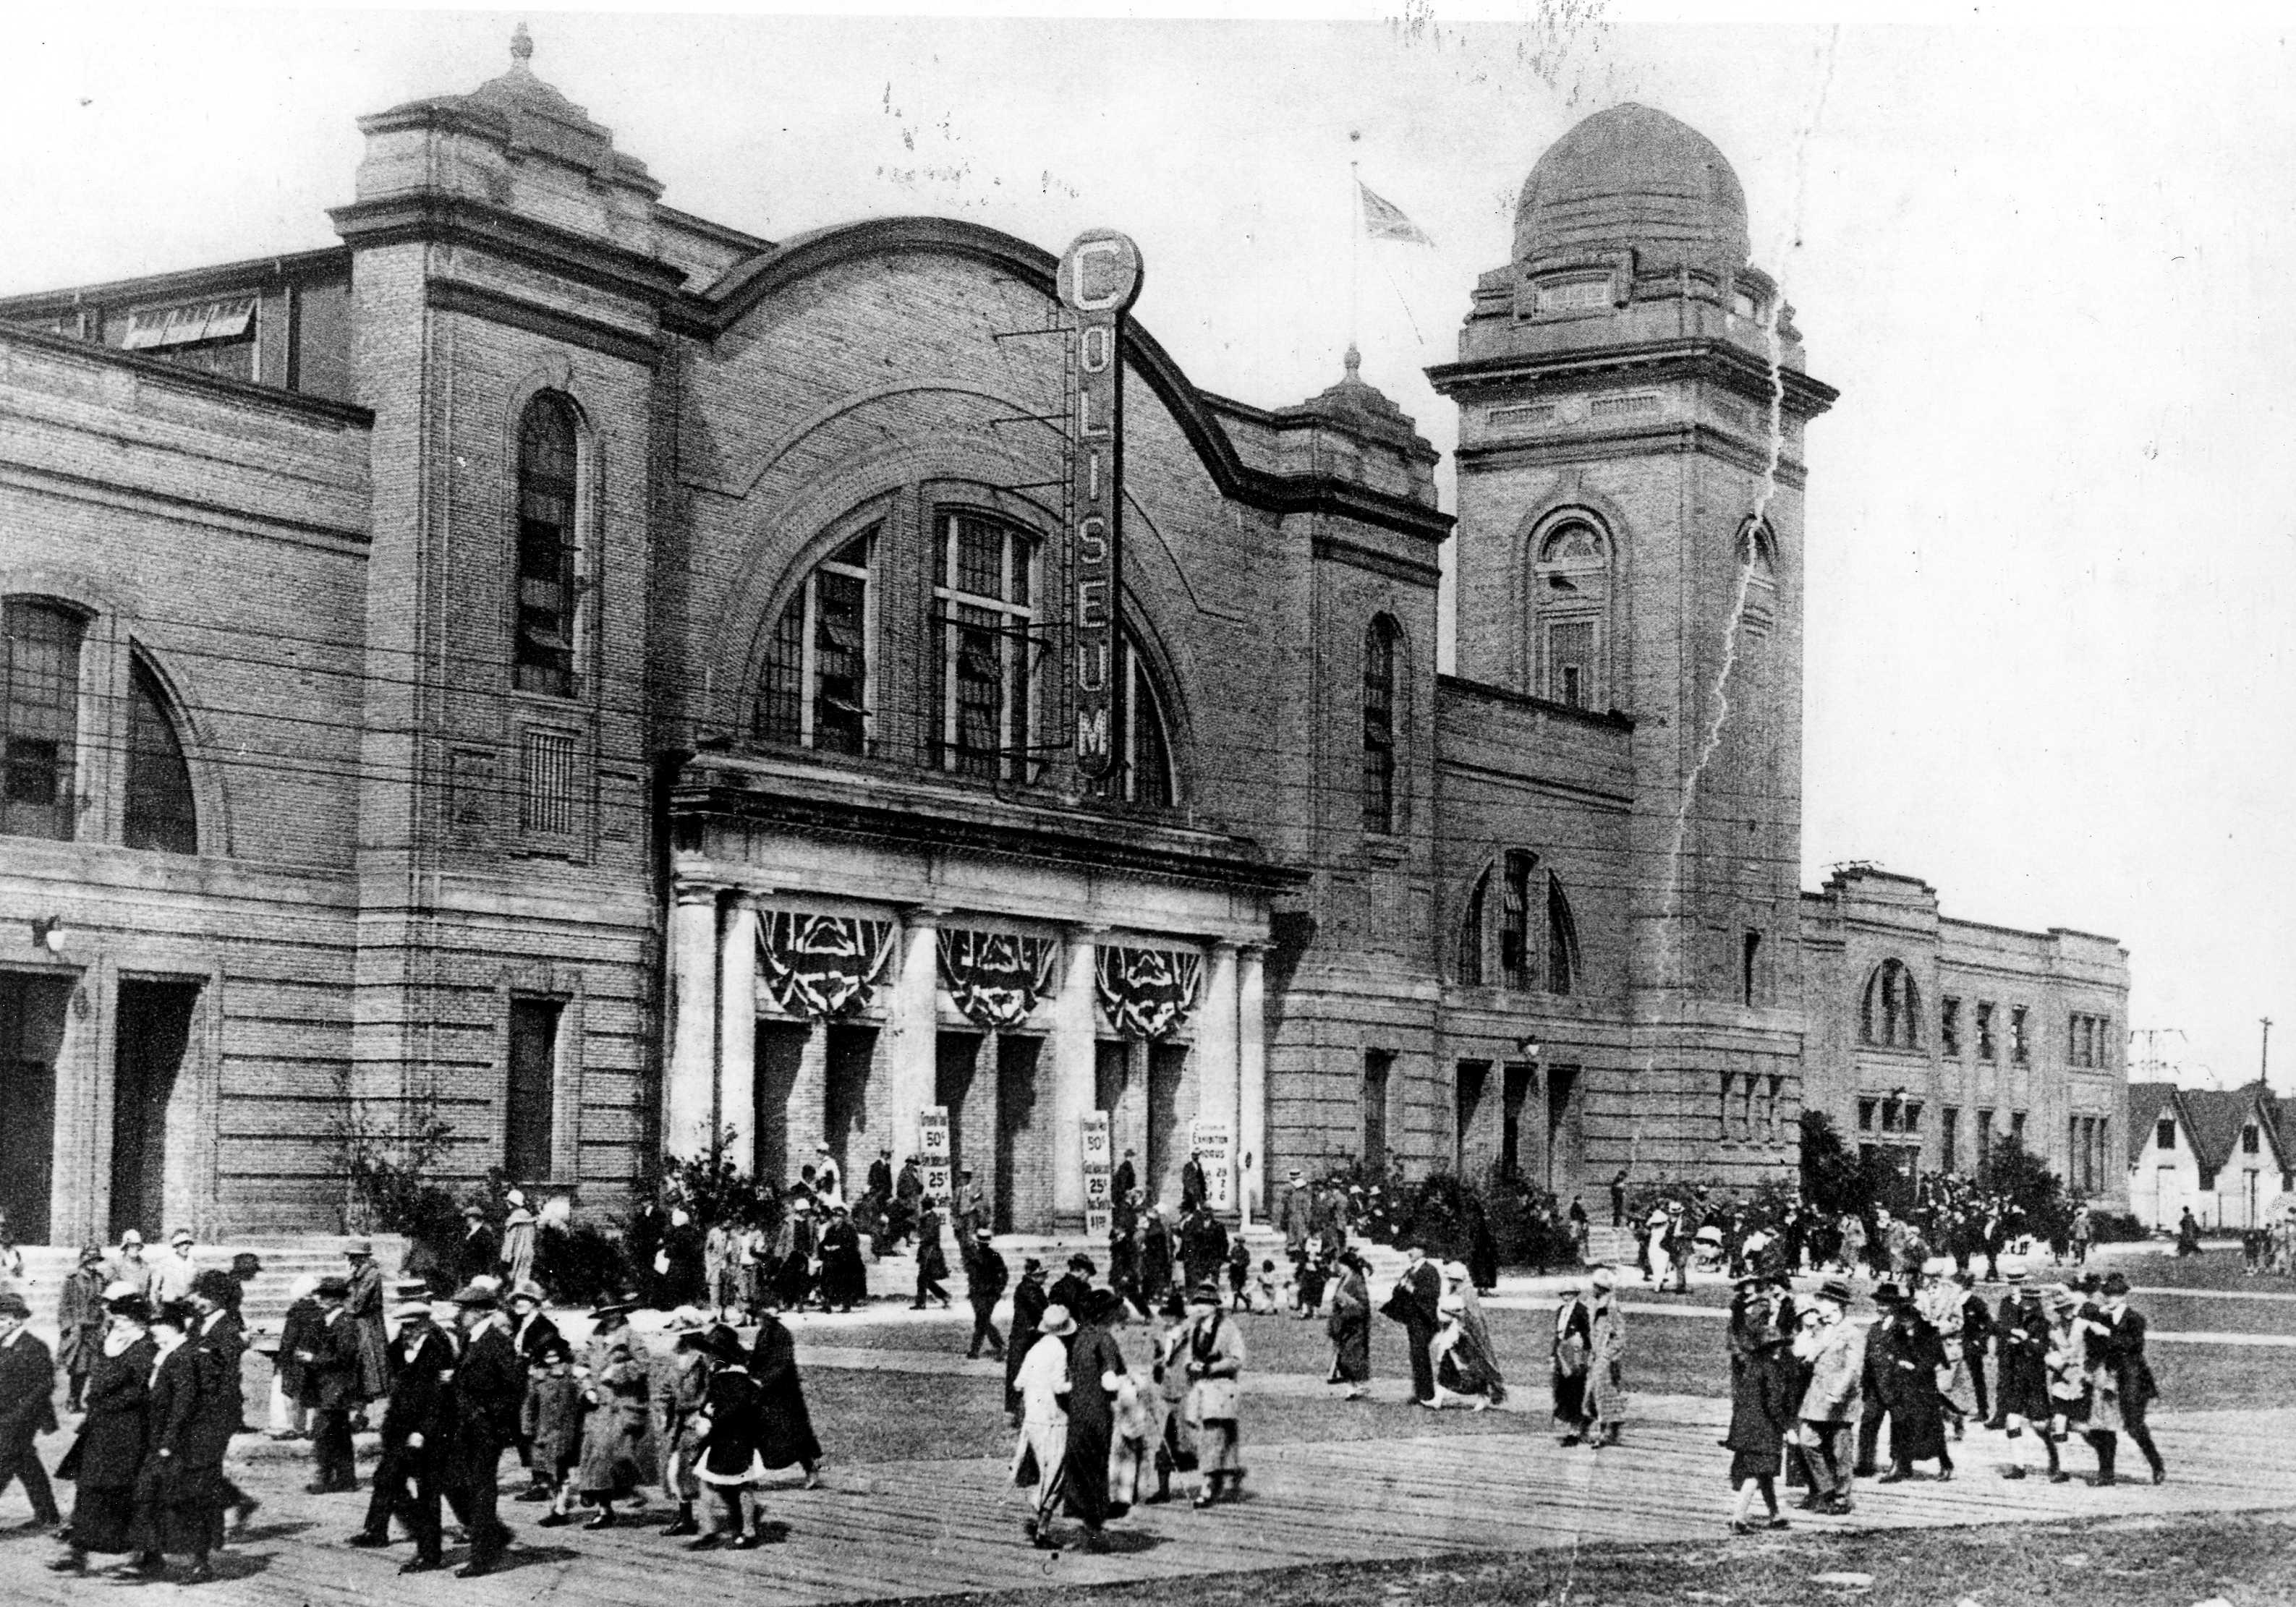 Coliseum_exterior_photo_ca_1922.jpg